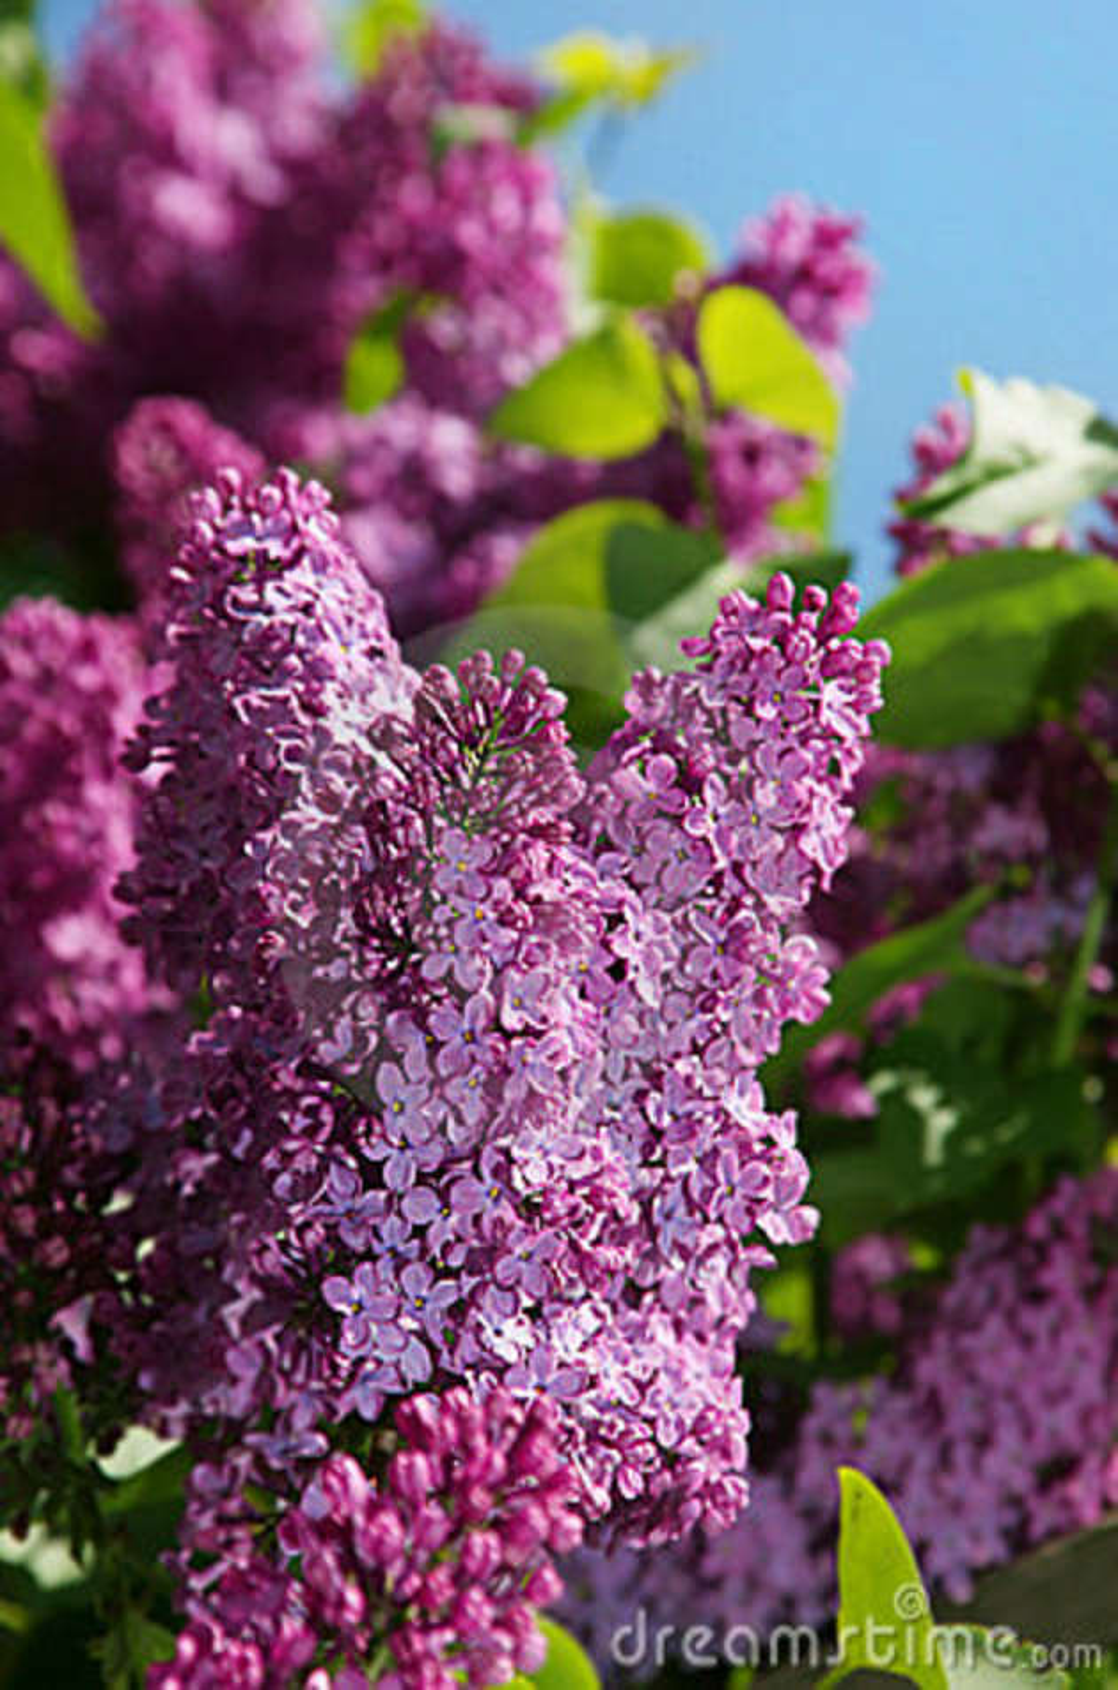 Purple Lilac Bush Flower Stock Photo Image Of Outdoor